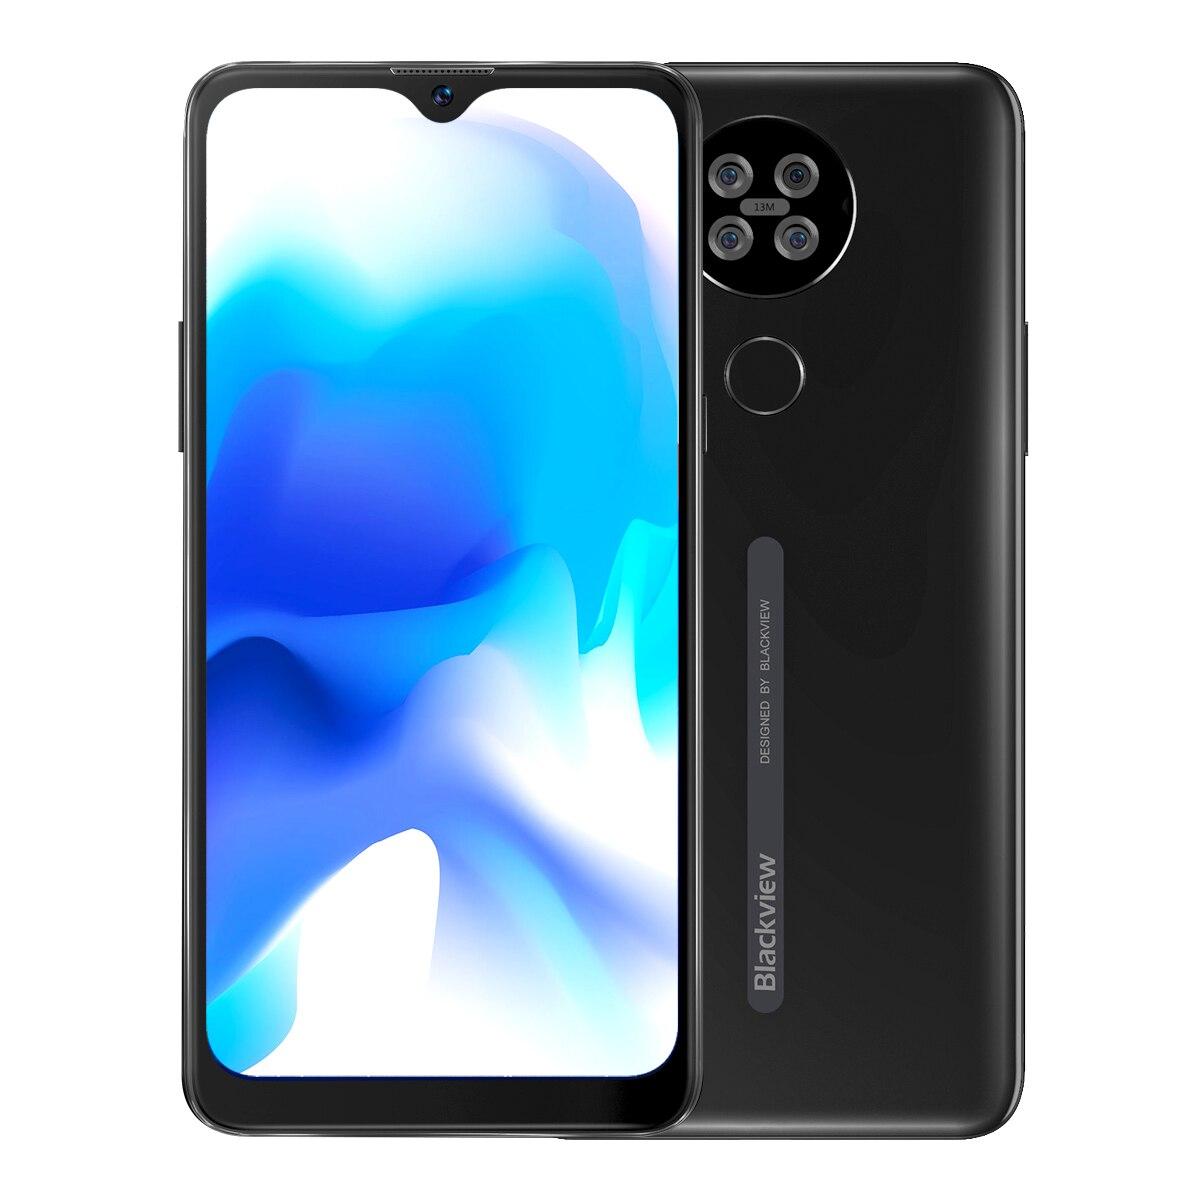 Blackview-هاتف خلوي 4G A80s ، شاشة 6.217 بوصة ، هاتف ذكي ، Android 10 ، MT6762V/WD ، ثماني النواة ، 4 جيجا بايت رام ، 64 جيجا بايت روم ، 4200 مللي أمبير